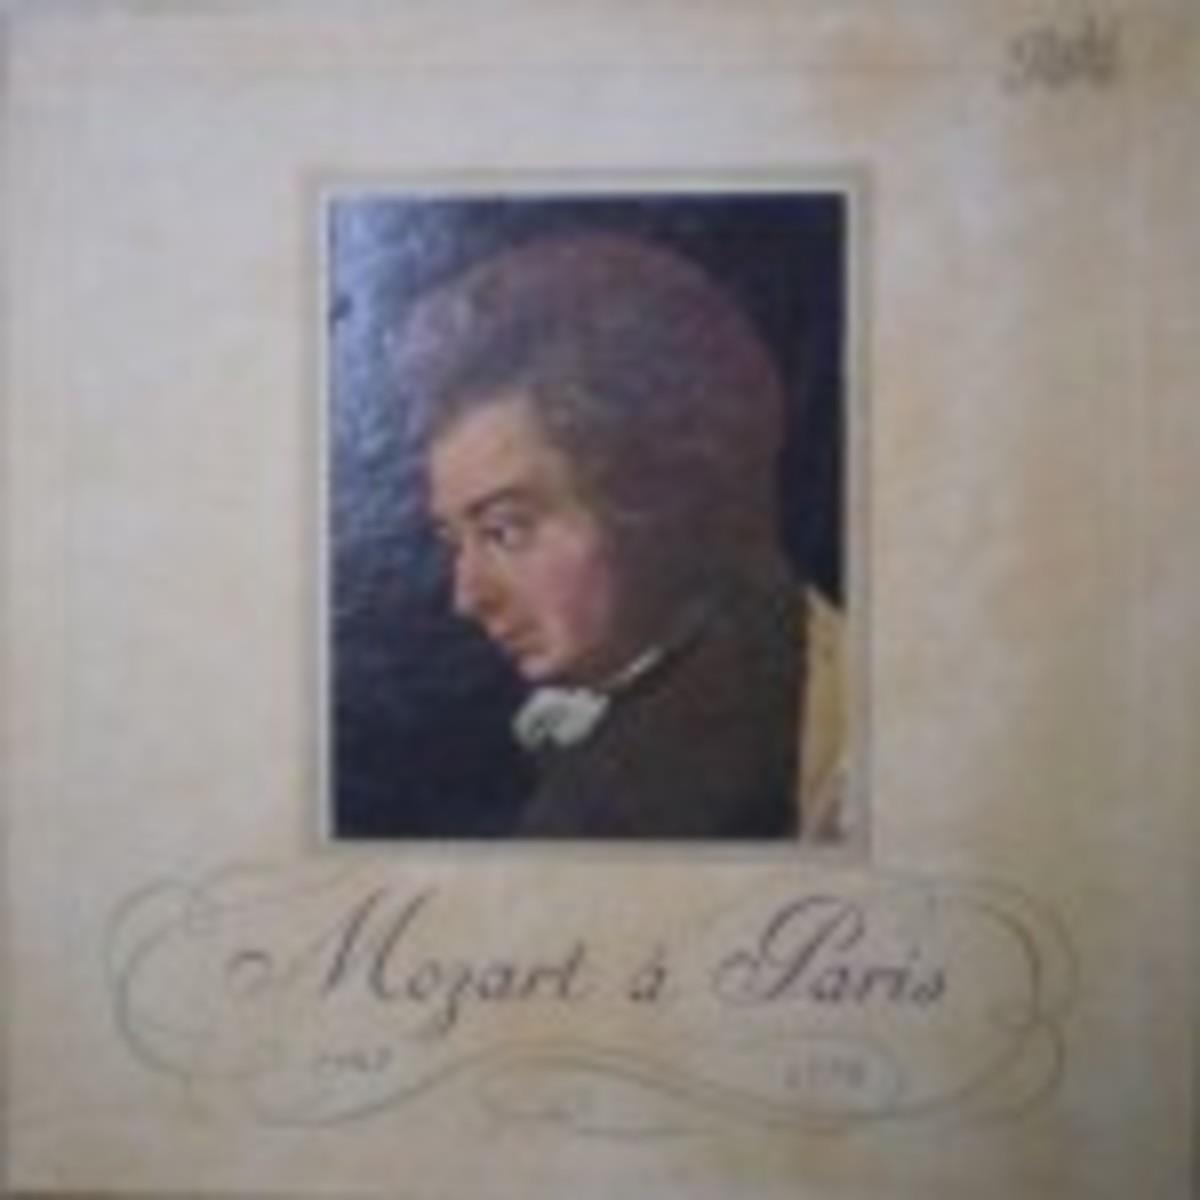 Mozart A Paris